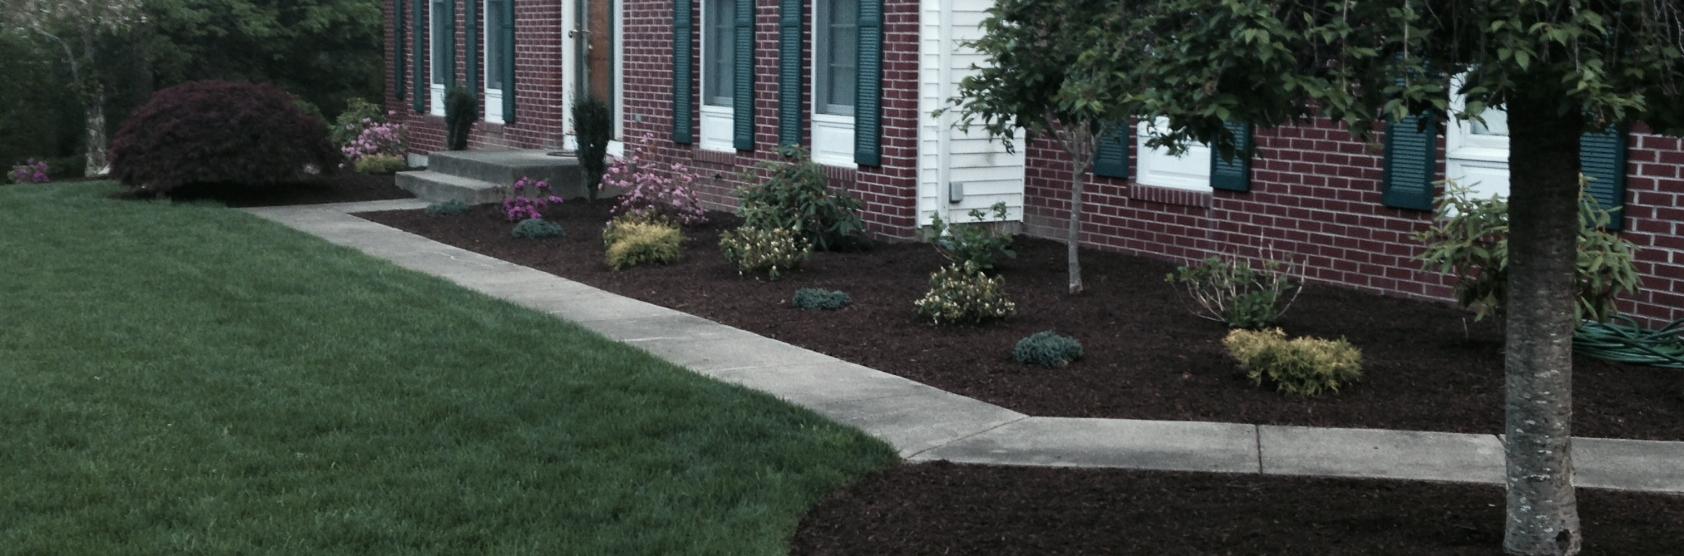 Fratelli Landscaping, Inc.